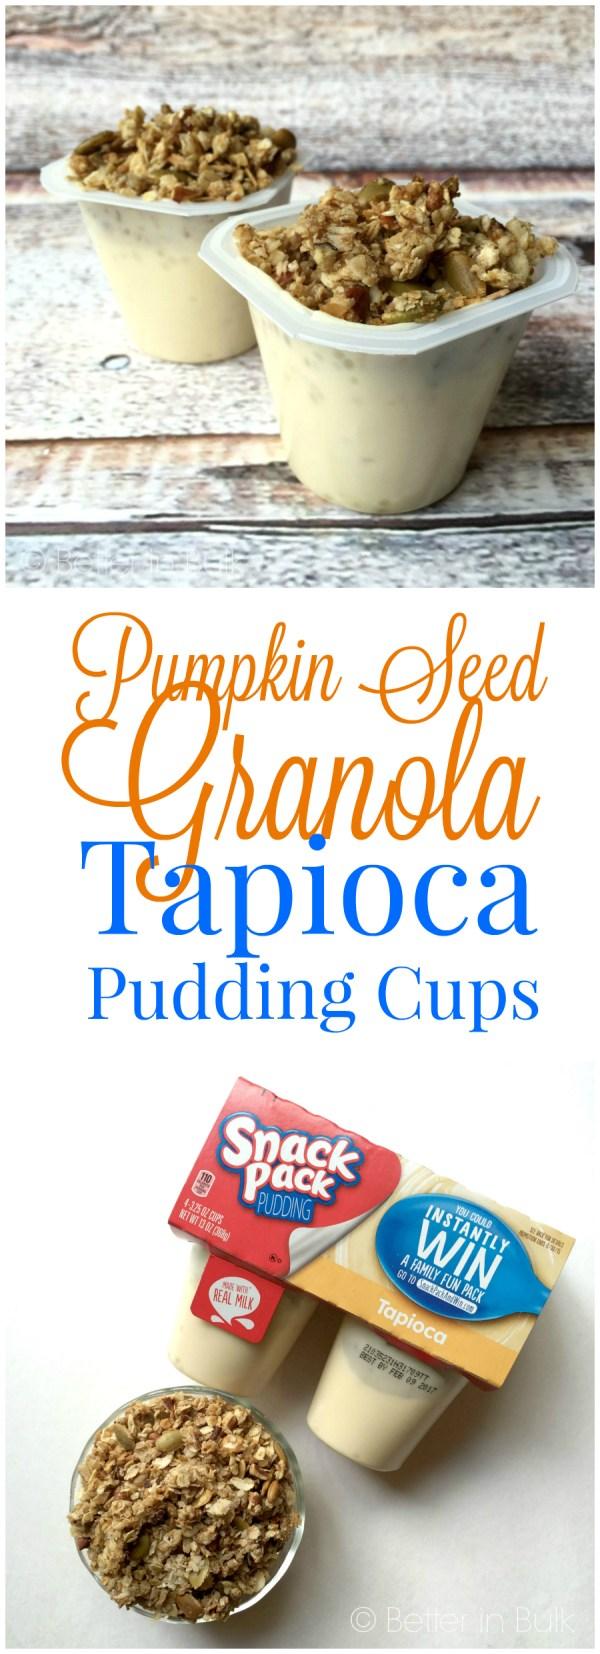 Pumpkin Seed Granola Tapioca Pudding Cups Halloween recipe from Better in Bulk